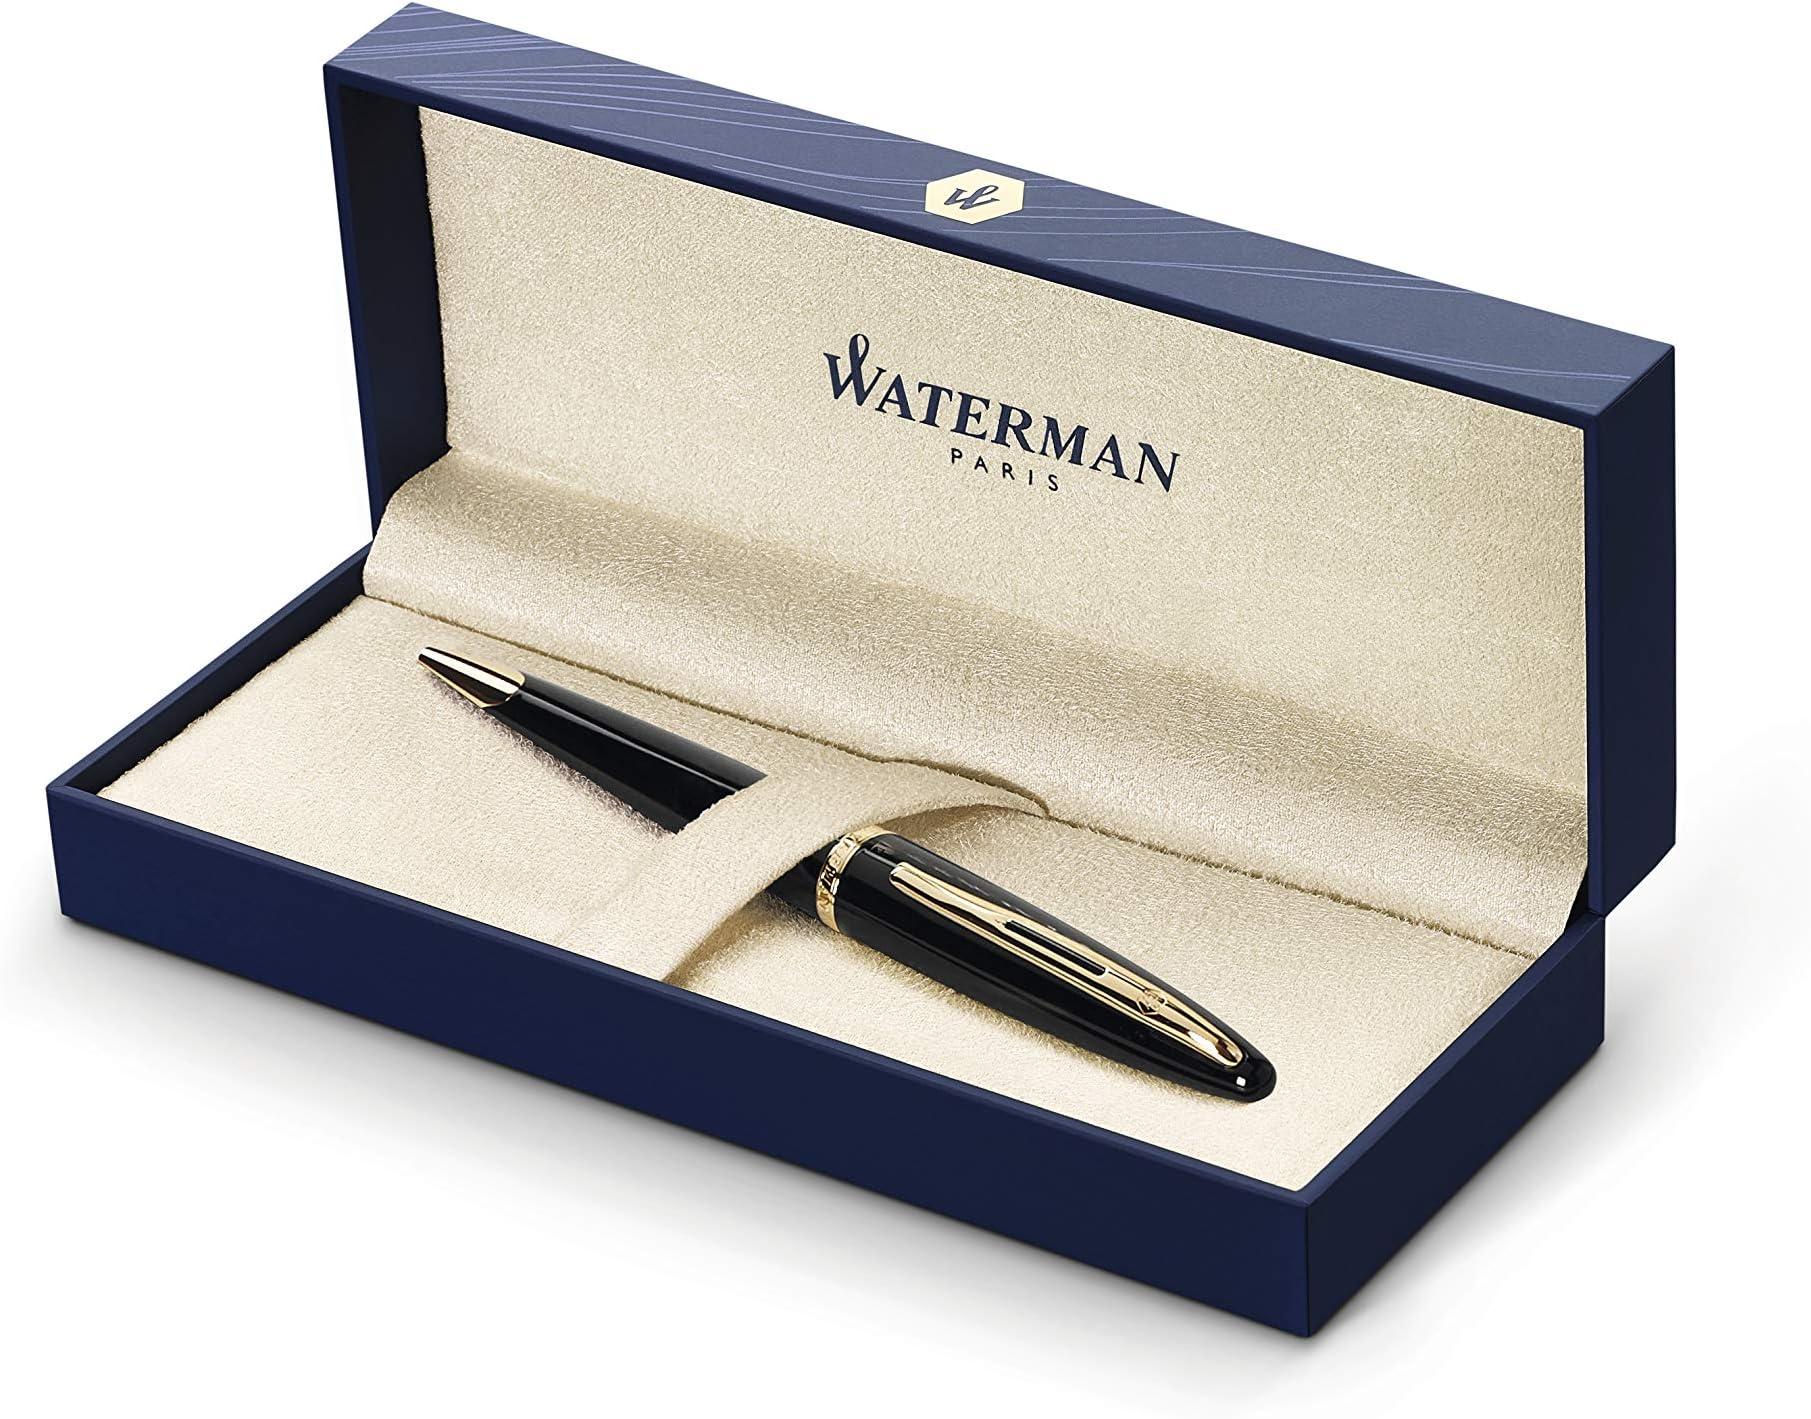 Waterman Carene Rollerball Pen Black Sea Stainless Steel Trim New S0293940